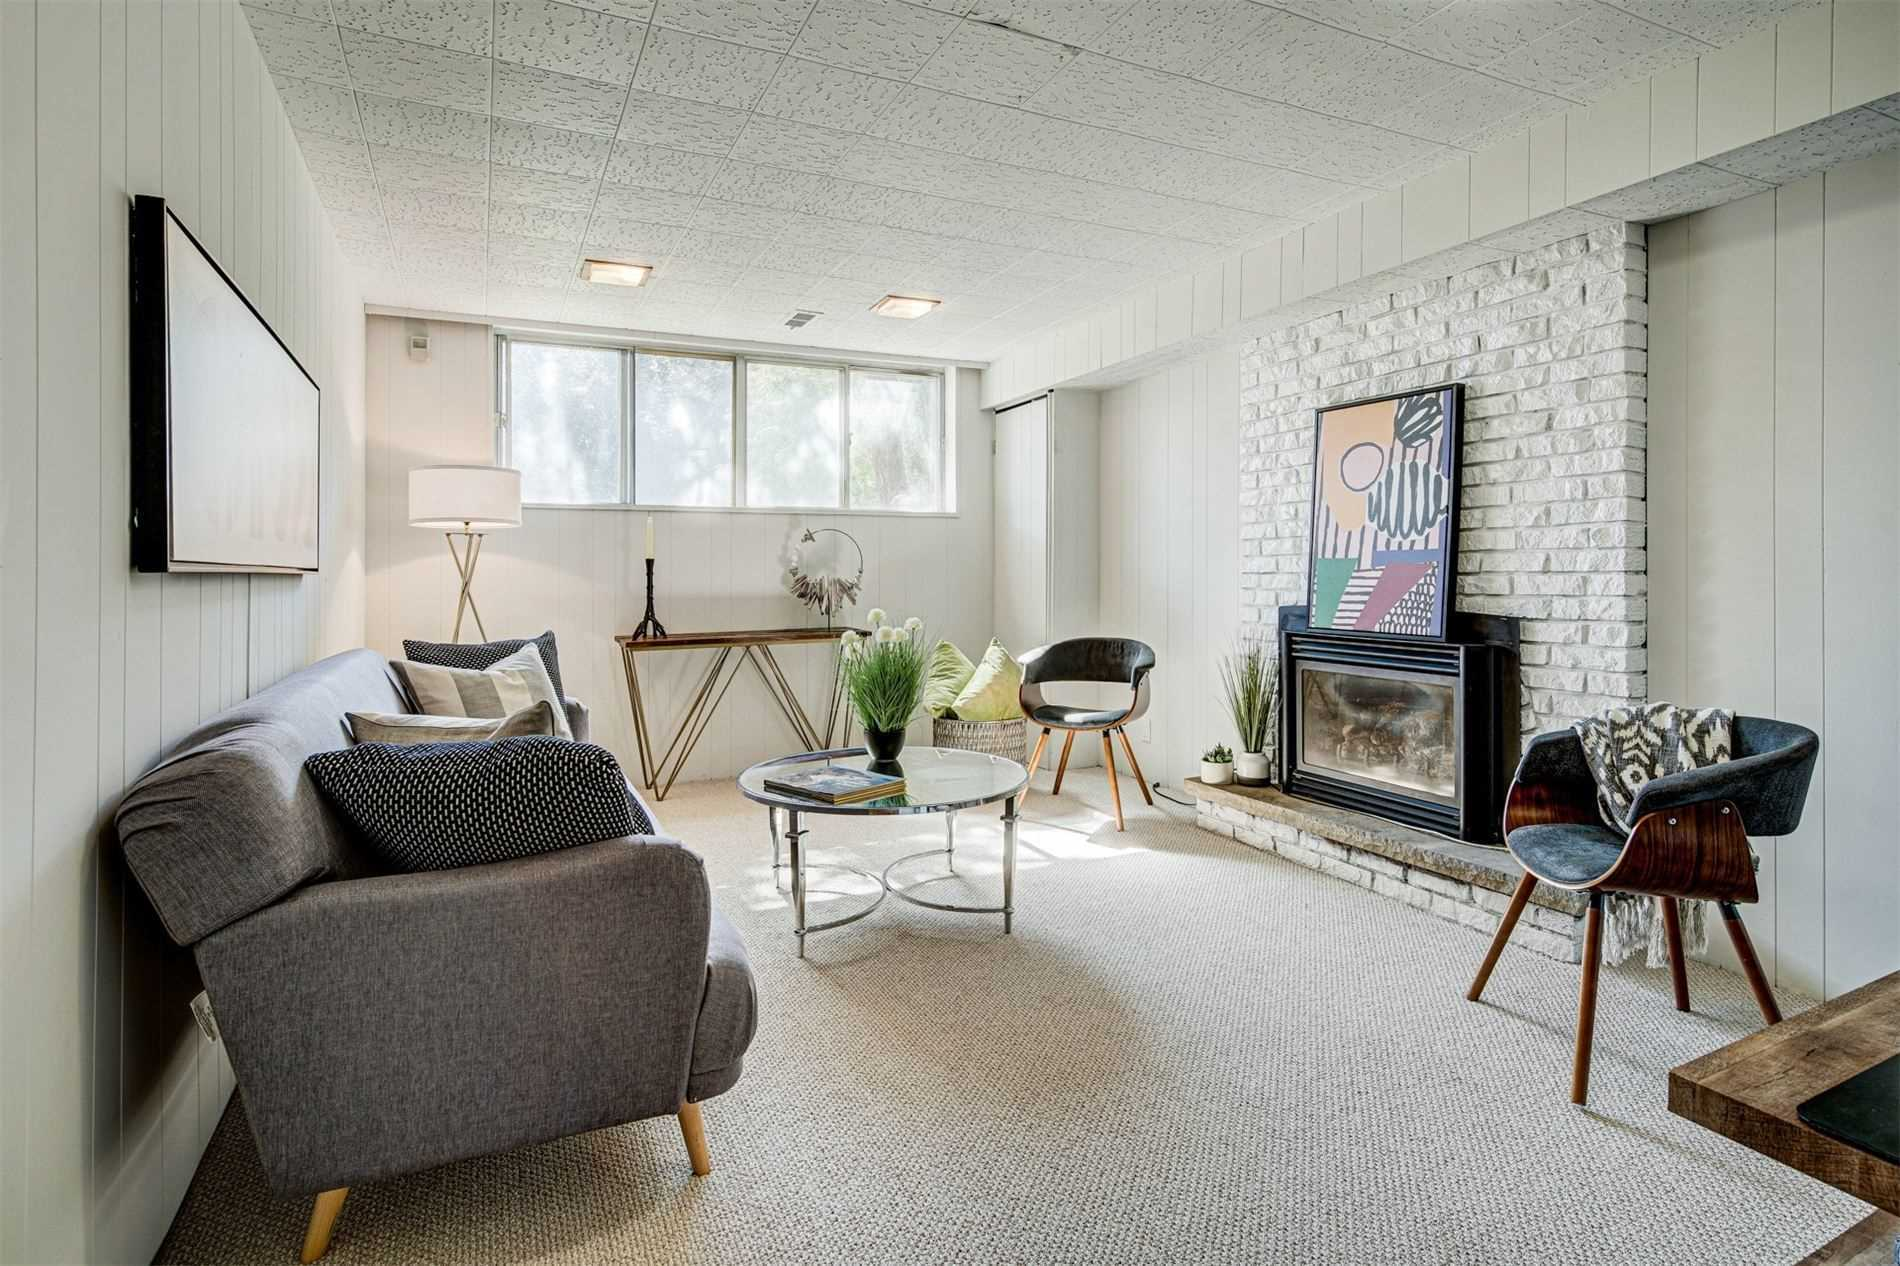 140 Verobeach Blvd - Humbermede Detached for sale, 3 Bedrooms (W5385046) - #23